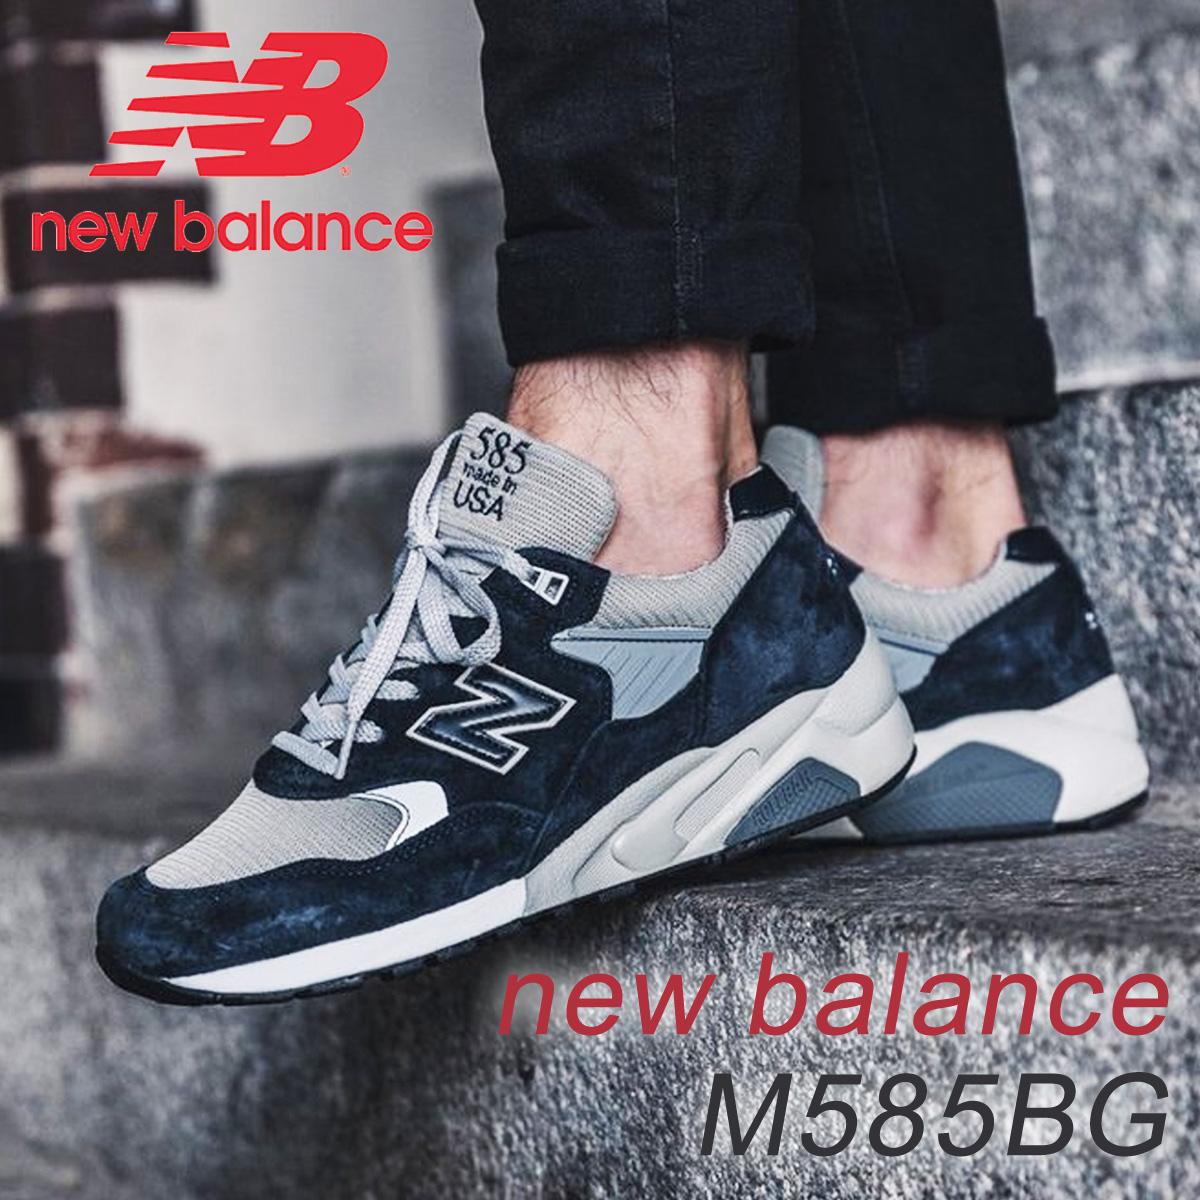 new balance m585